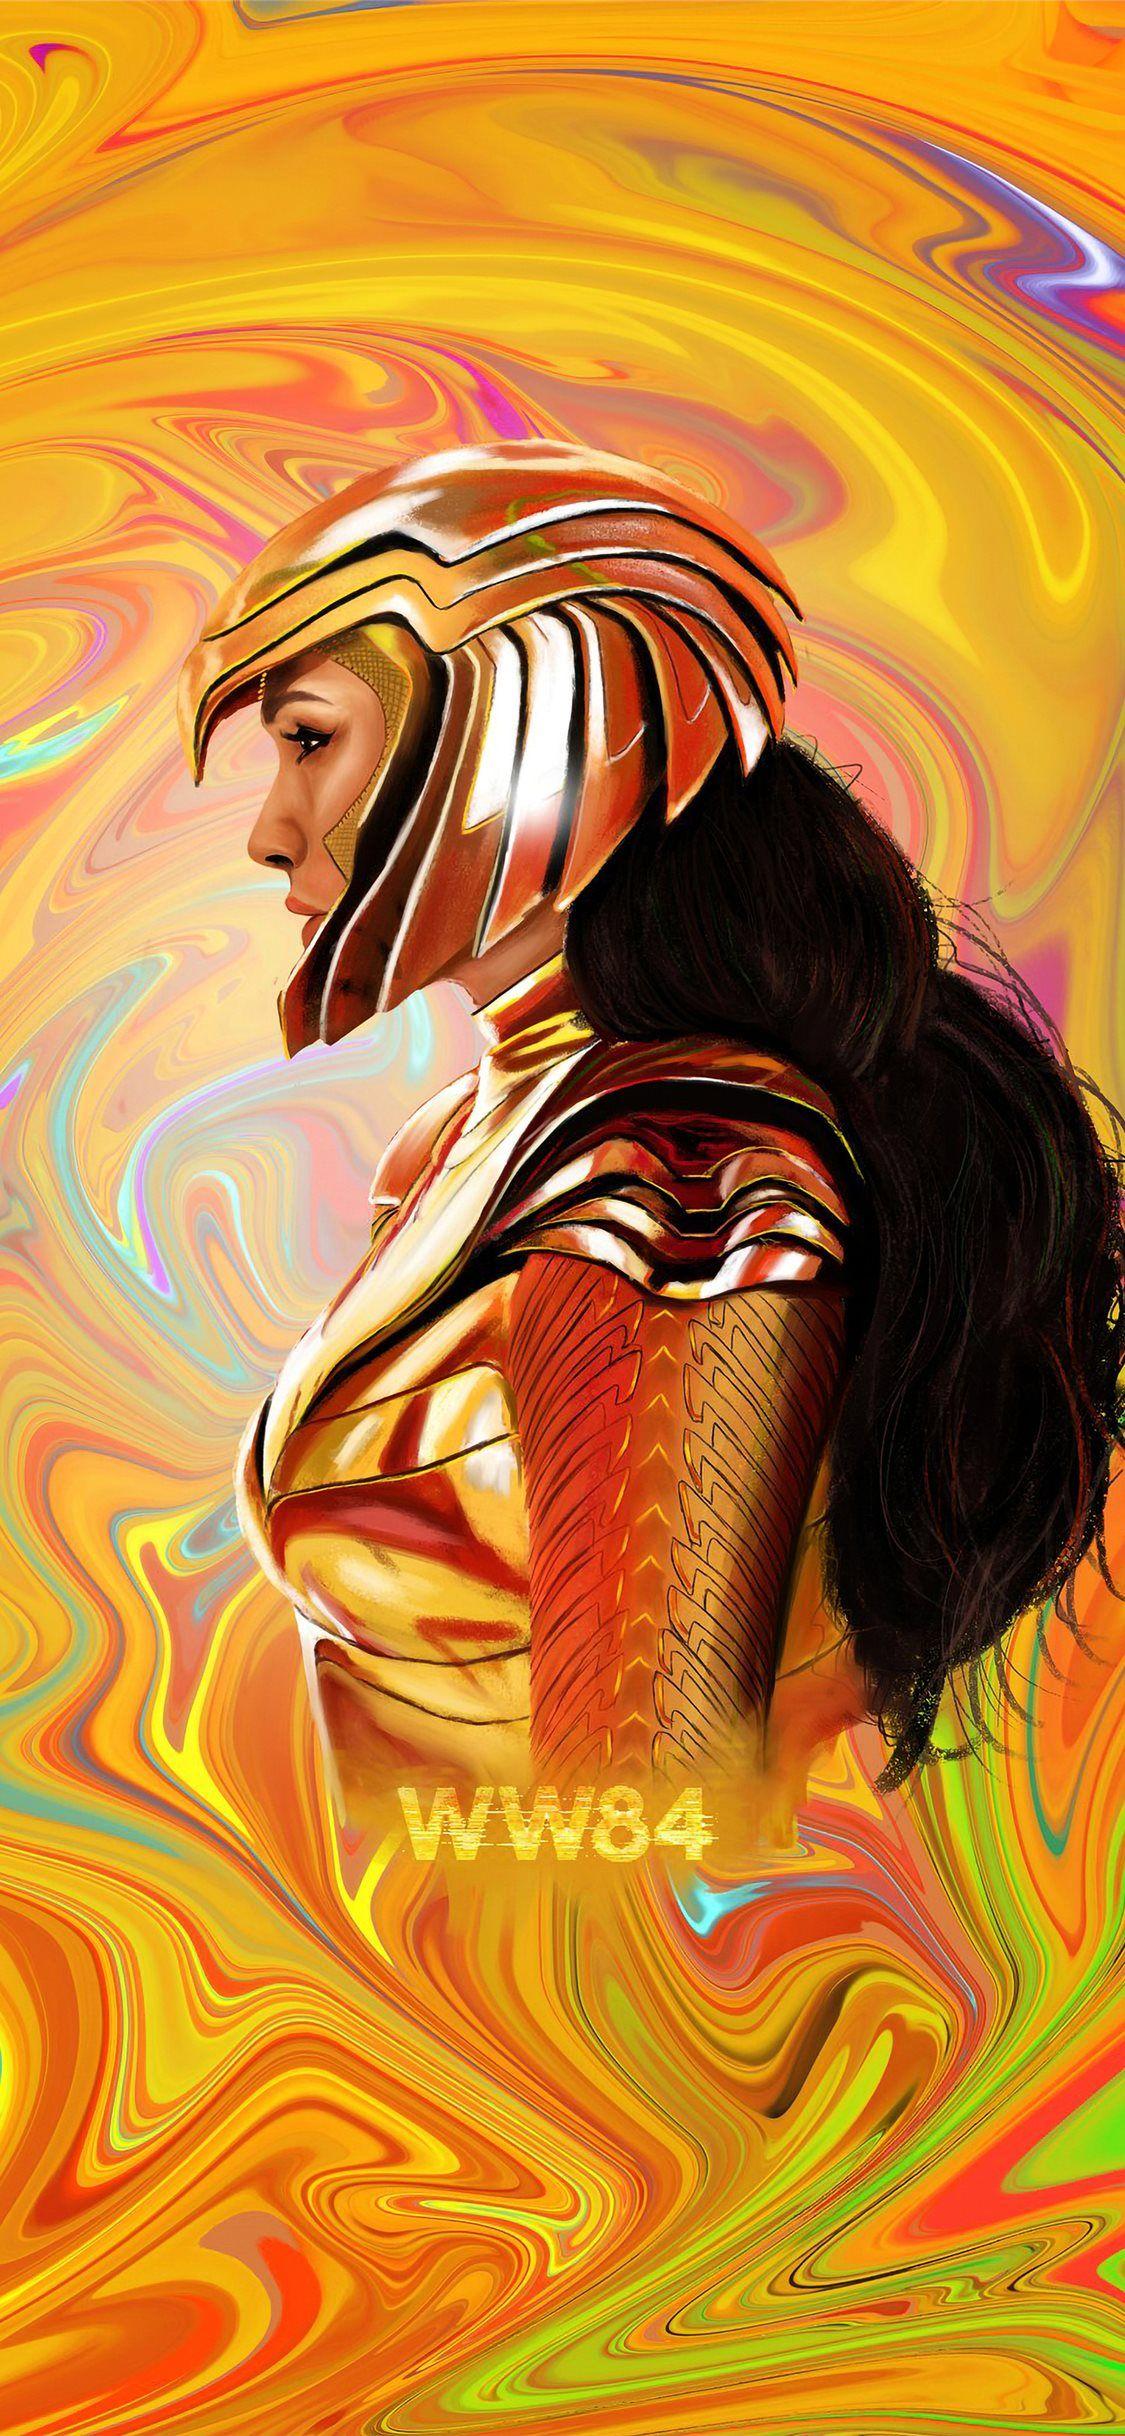 Wonder Woman 1984 4k Movie Wonderwoman1984 4k Wonderwoman2 Movies 2020movies Galgadot Dianaprince Iphonex In 2020 Gal Gadot Wonder Woman Wonder Woman Gal Gadot